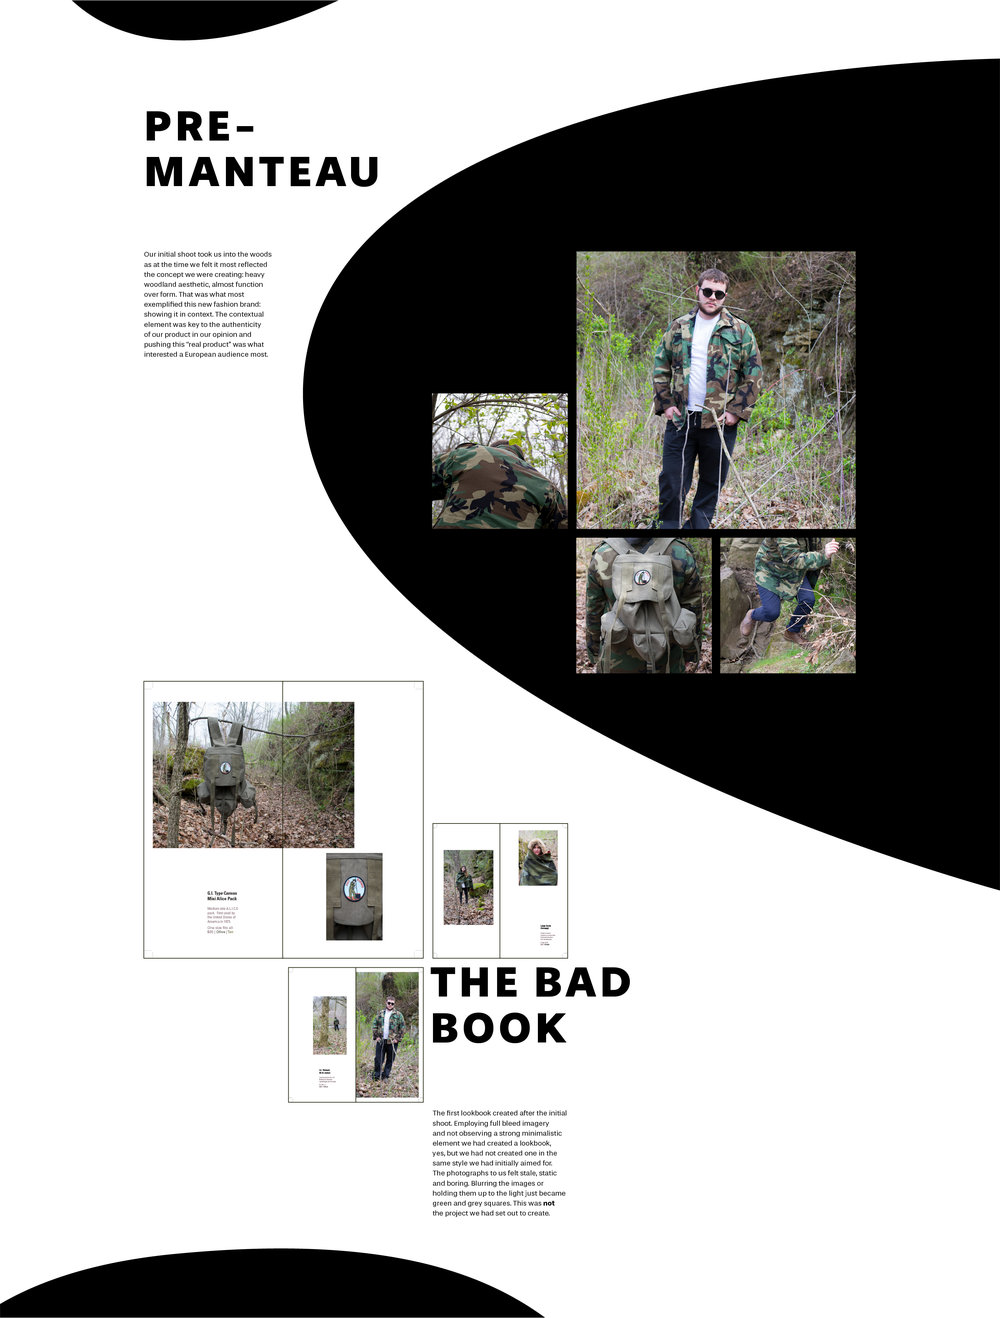 Manteau xp2.jpg